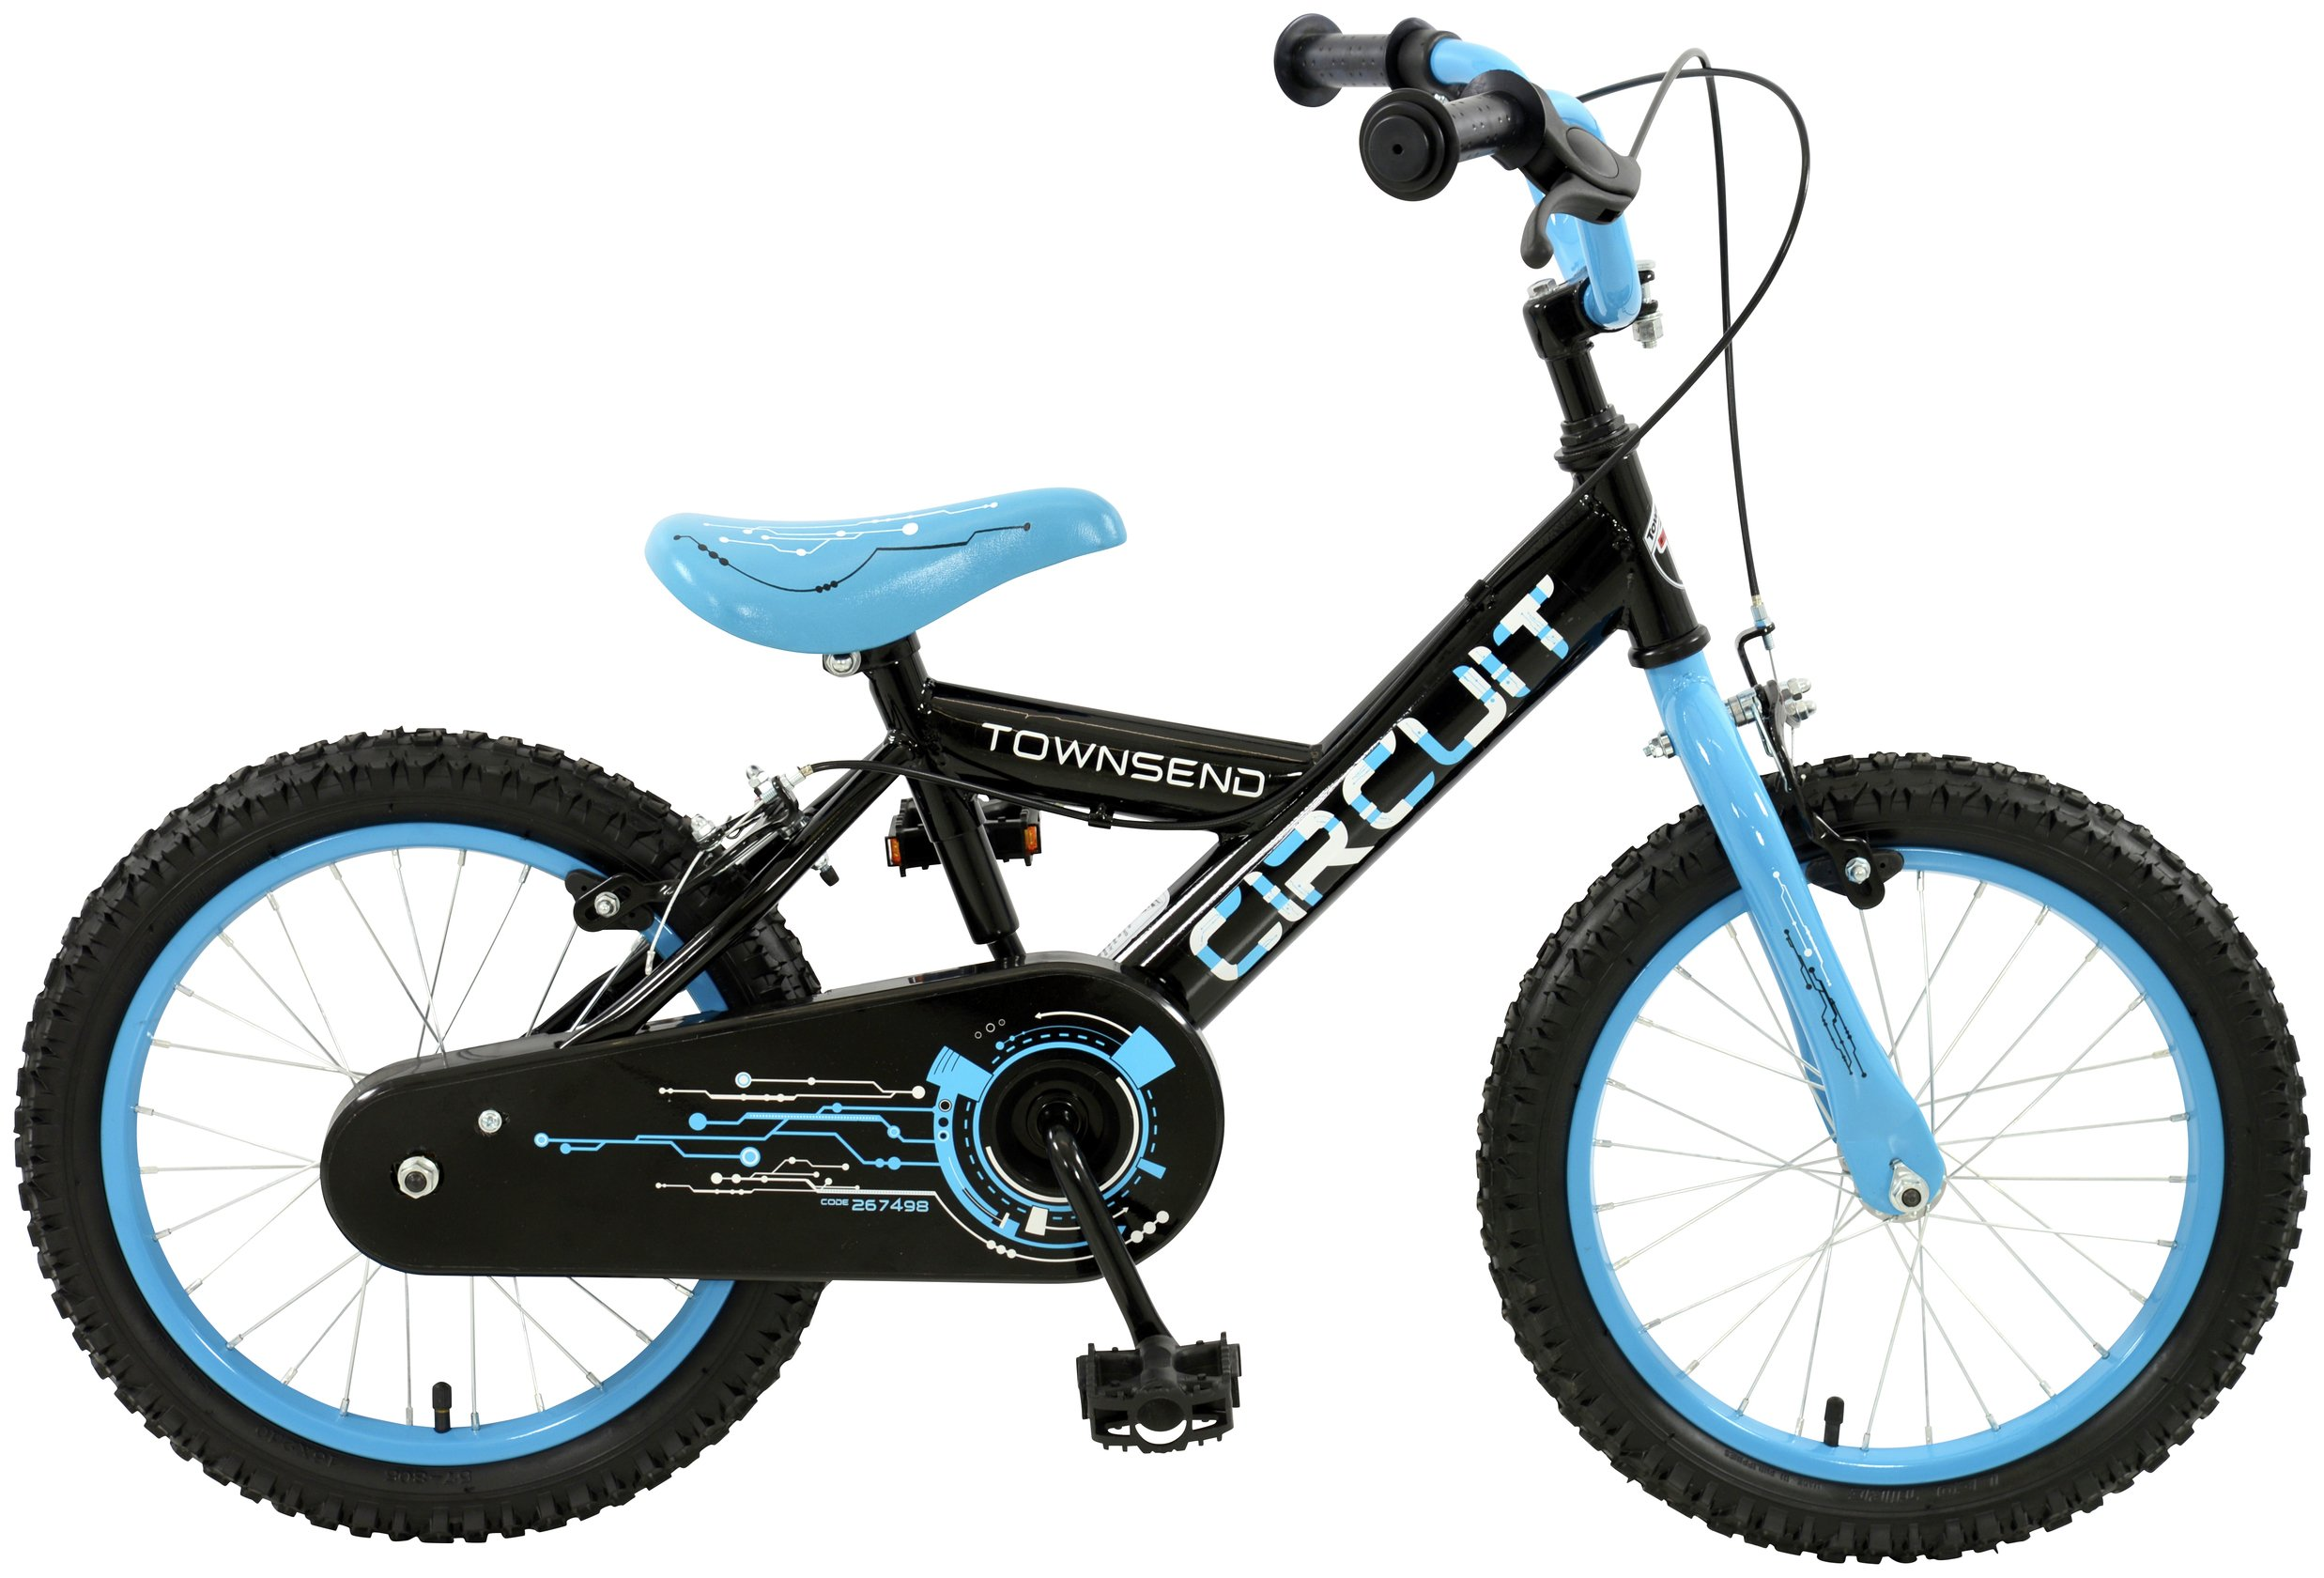 Townsend Circuit Kids 16 Inch Rigid Bike